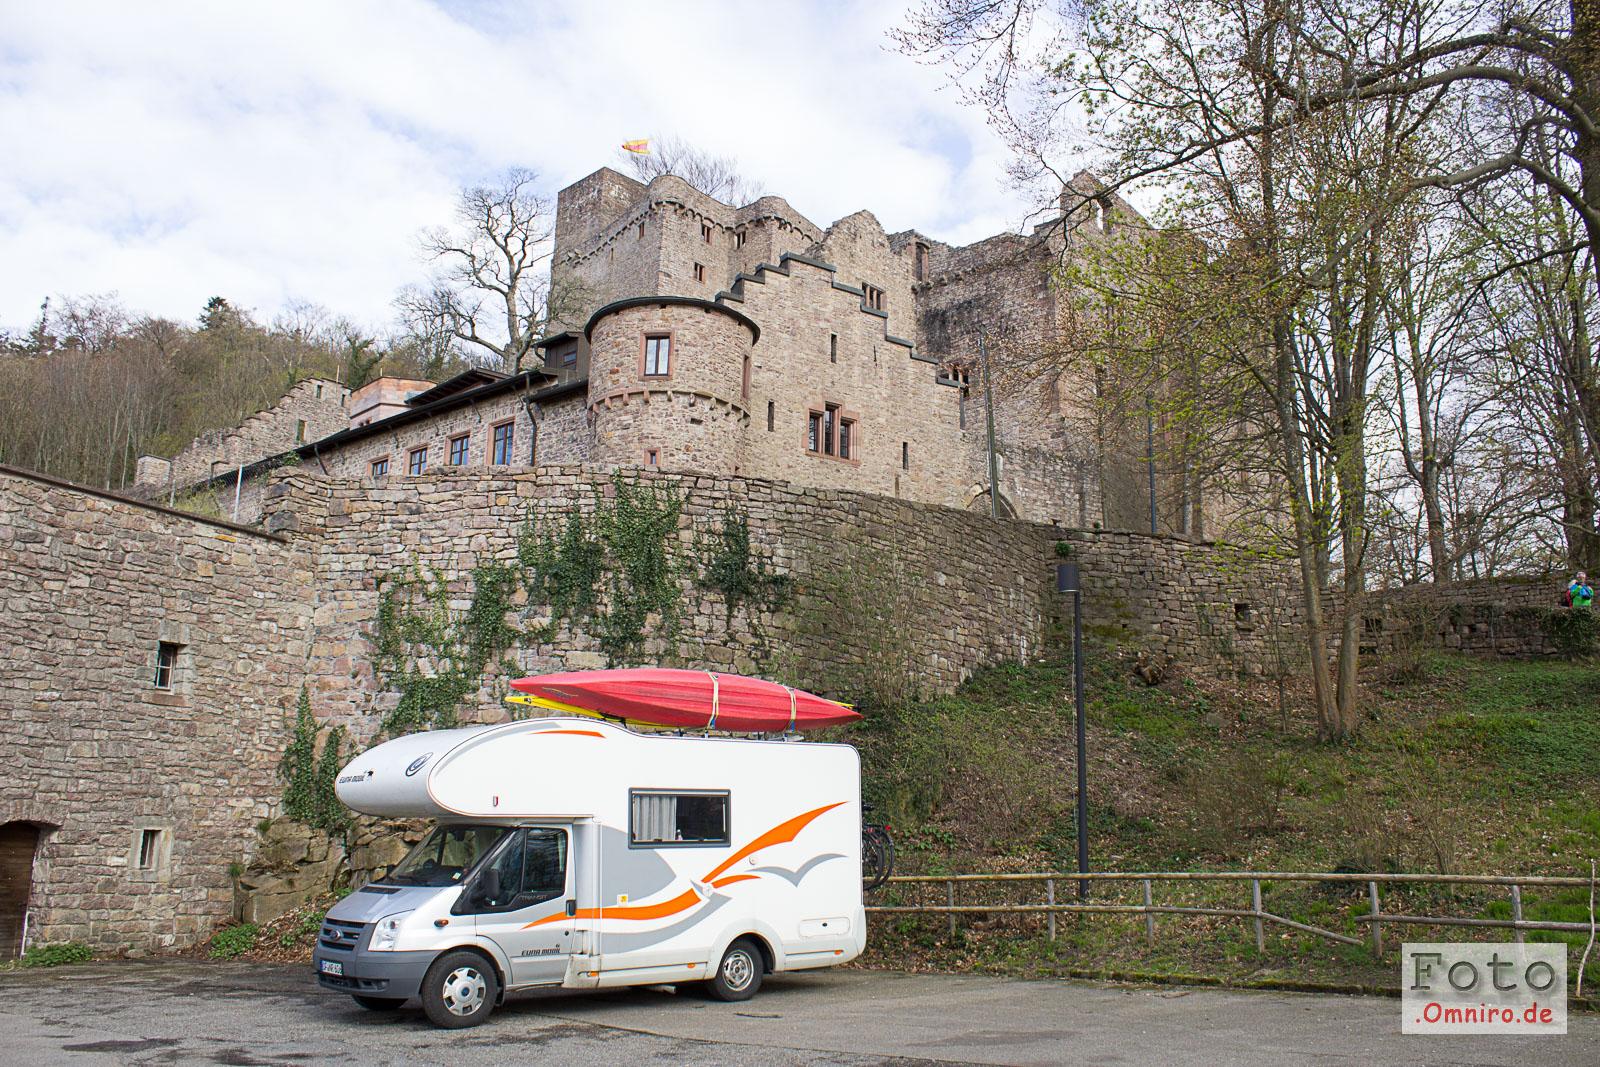 2016-04-07_16-22-16_Bodenseetour__MG_9103-1600